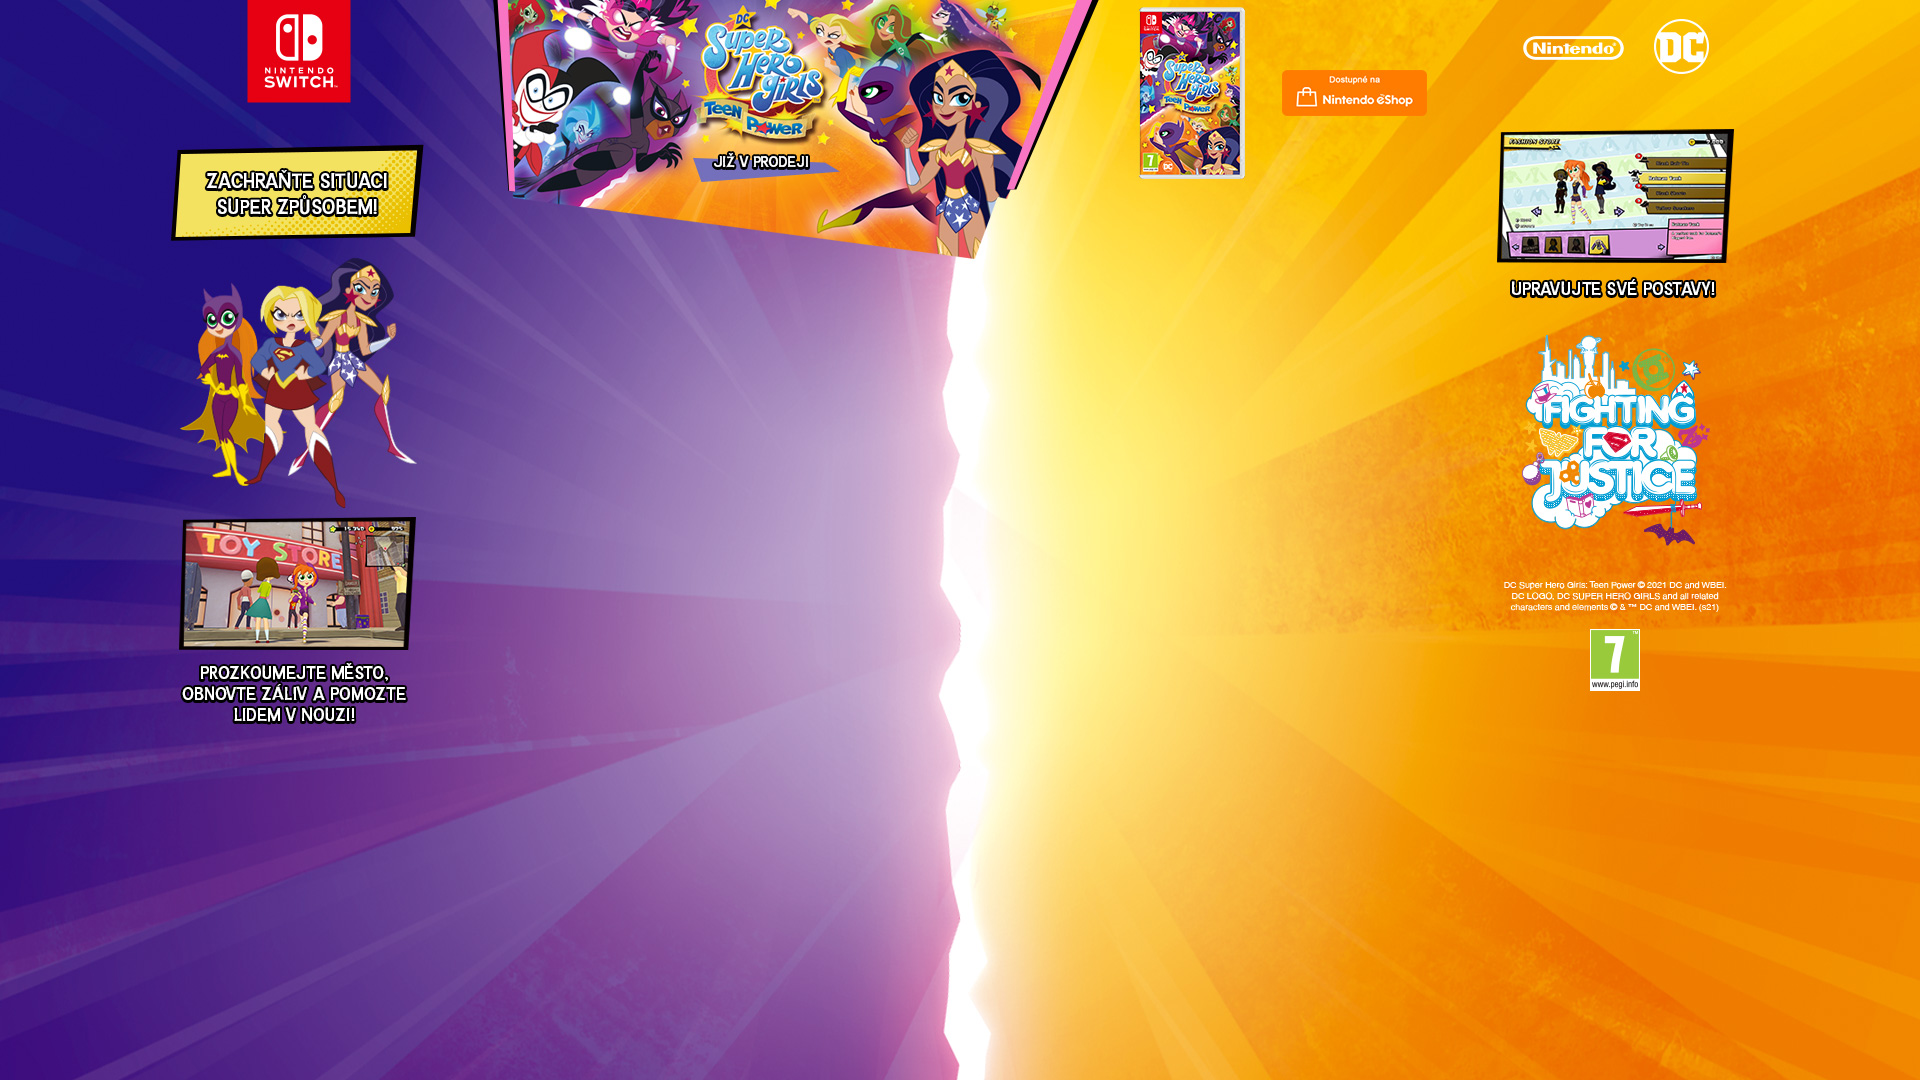 NINTENDOSHOP SWITCH DC Super Hero Girls: Teen Power